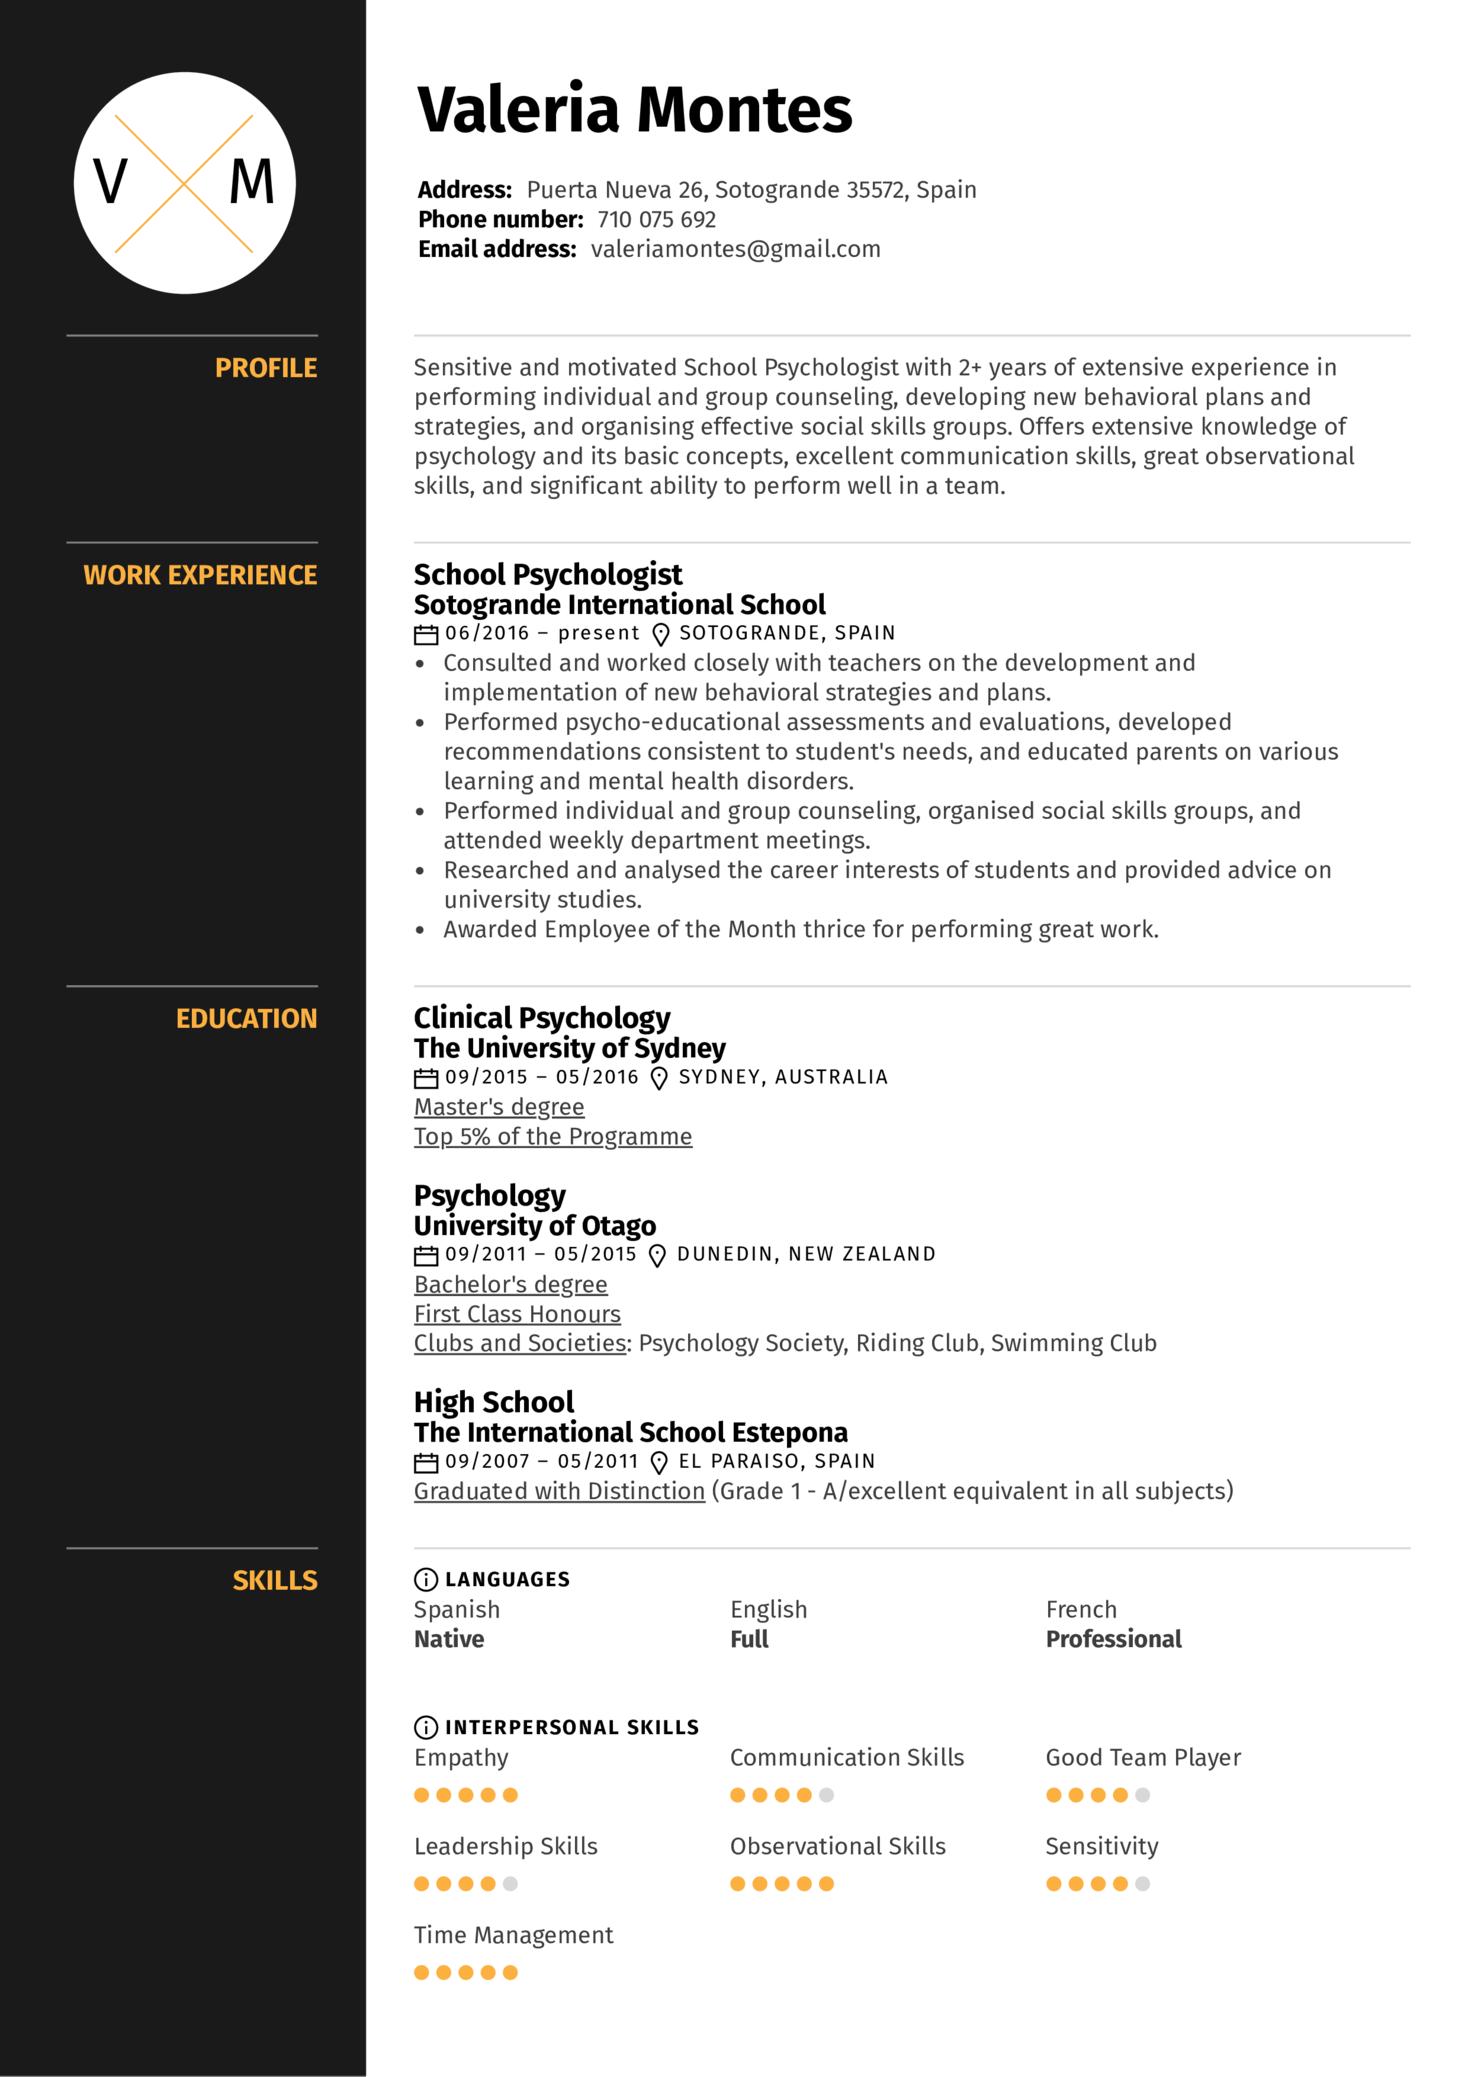 School Psychologist Resume Sample (Part 1)